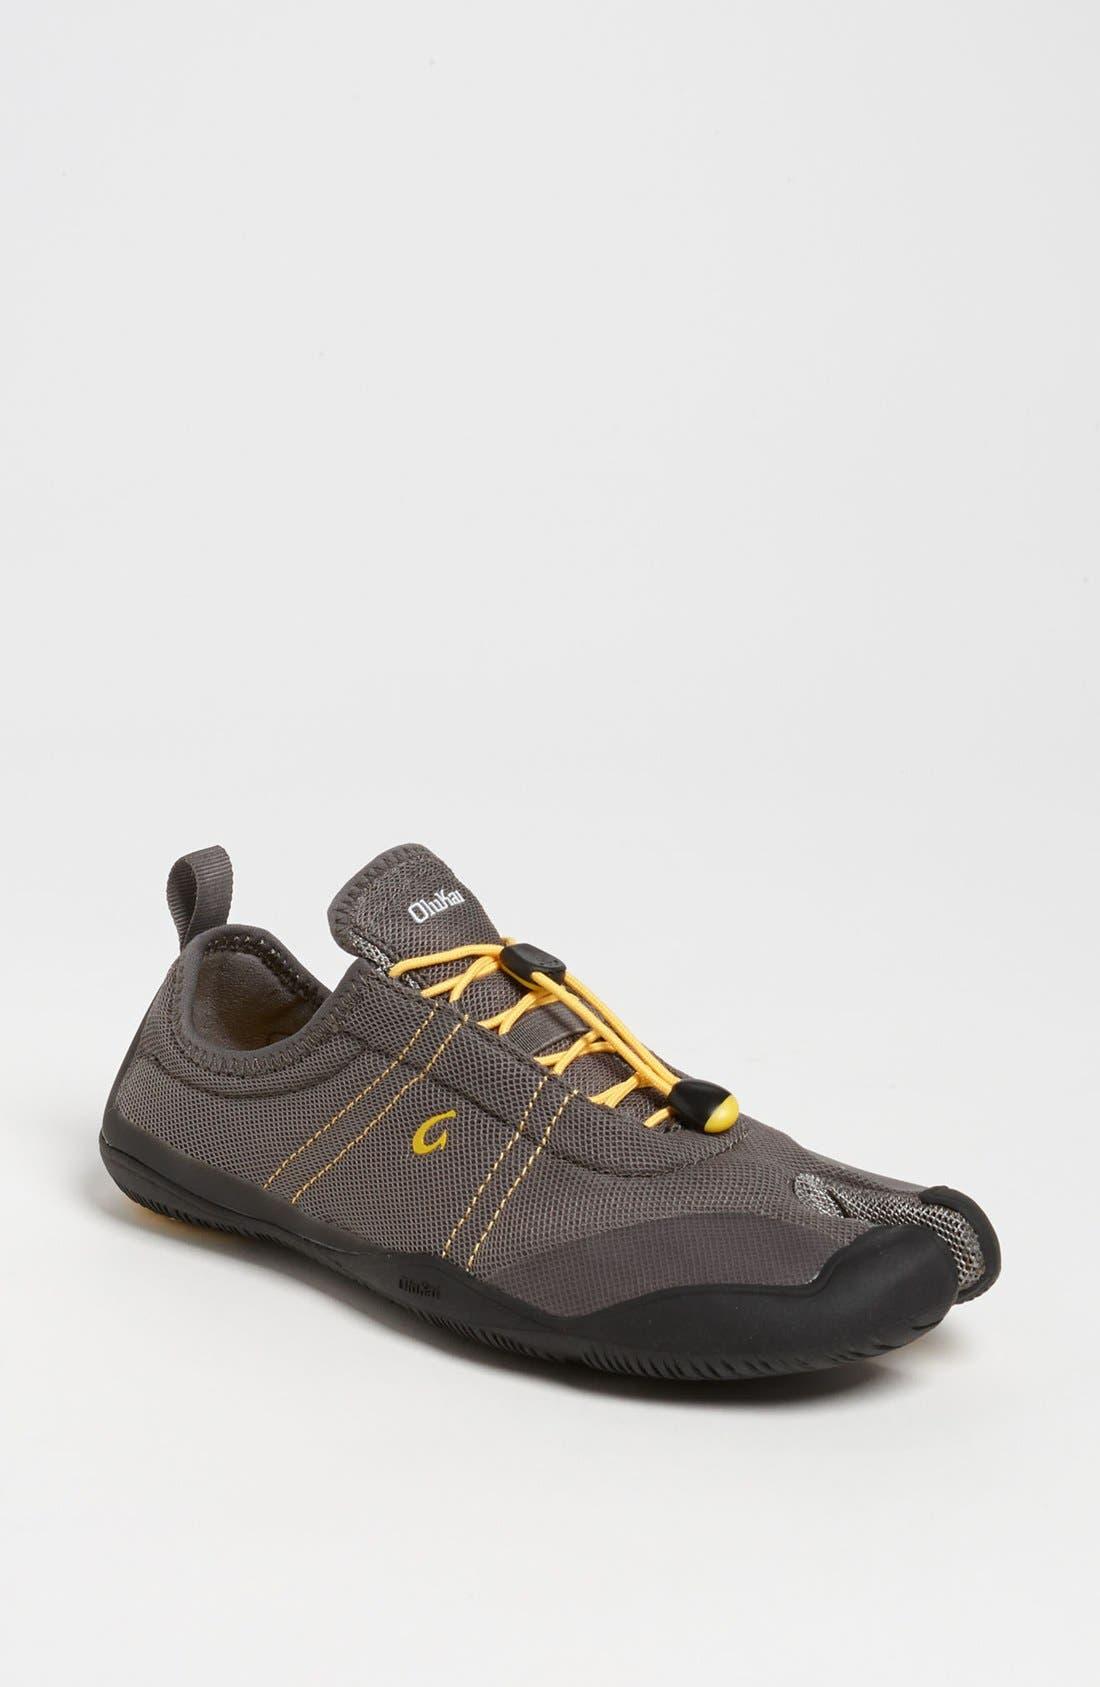 Alternate Image 1 Selected - OluKai 'Maliko' Sneaker (Men)